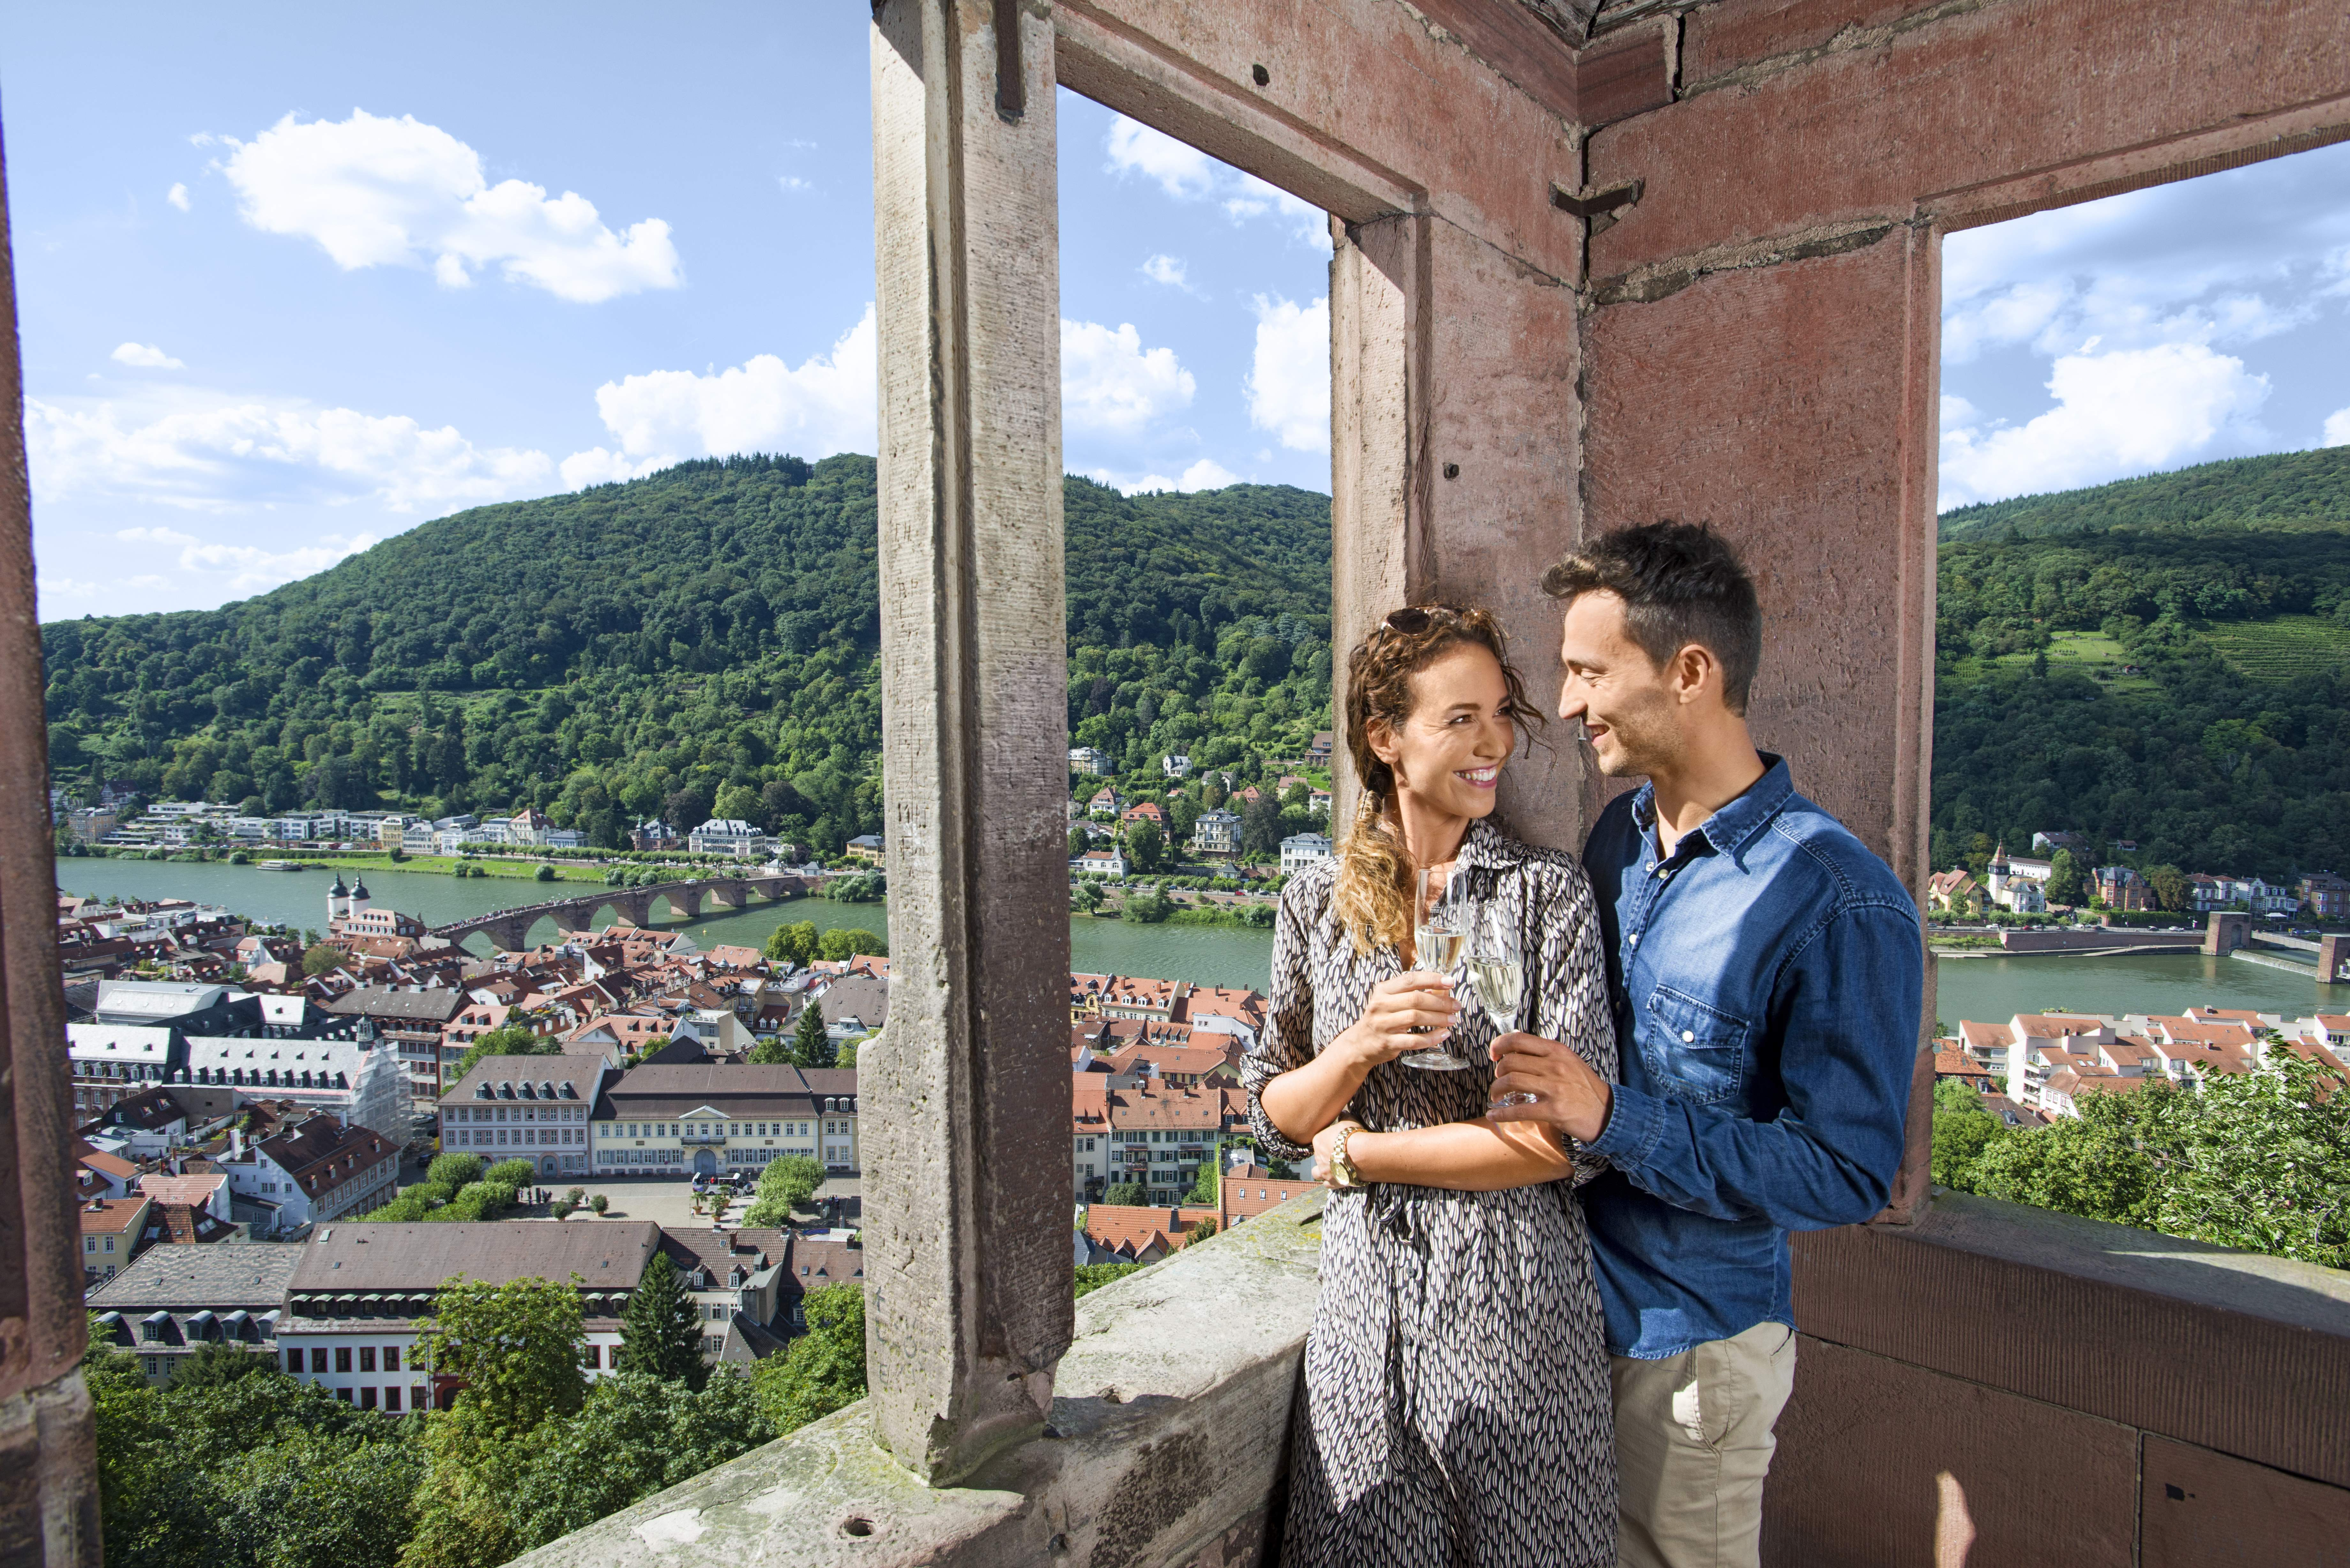 Geburtstag in Schloss Heidelberg